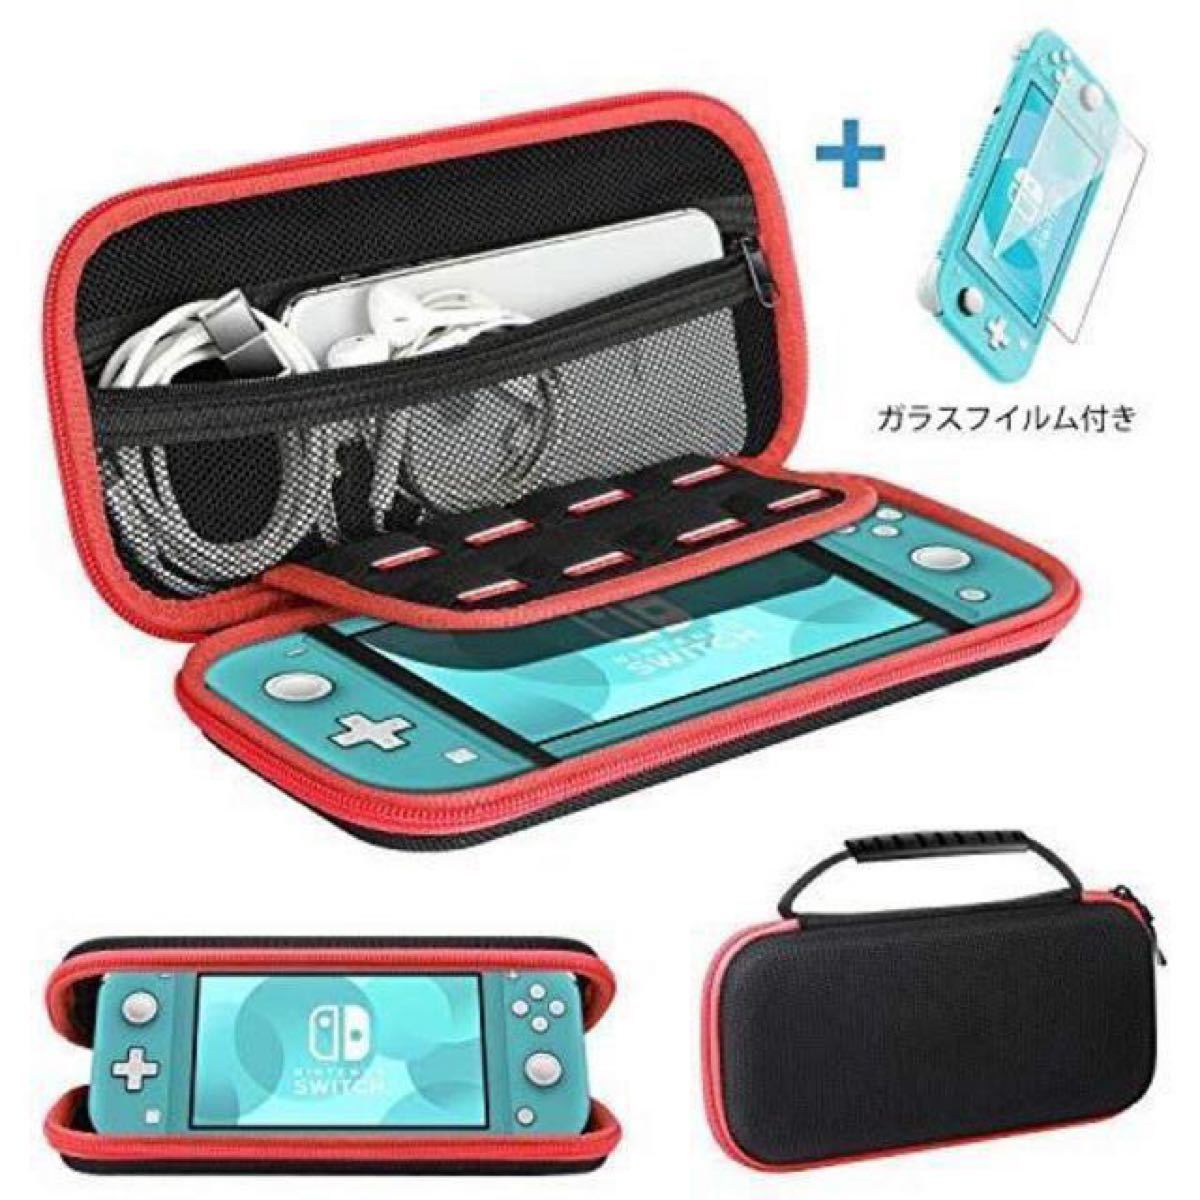 Nintendo Switch 任天堂スイッチケース